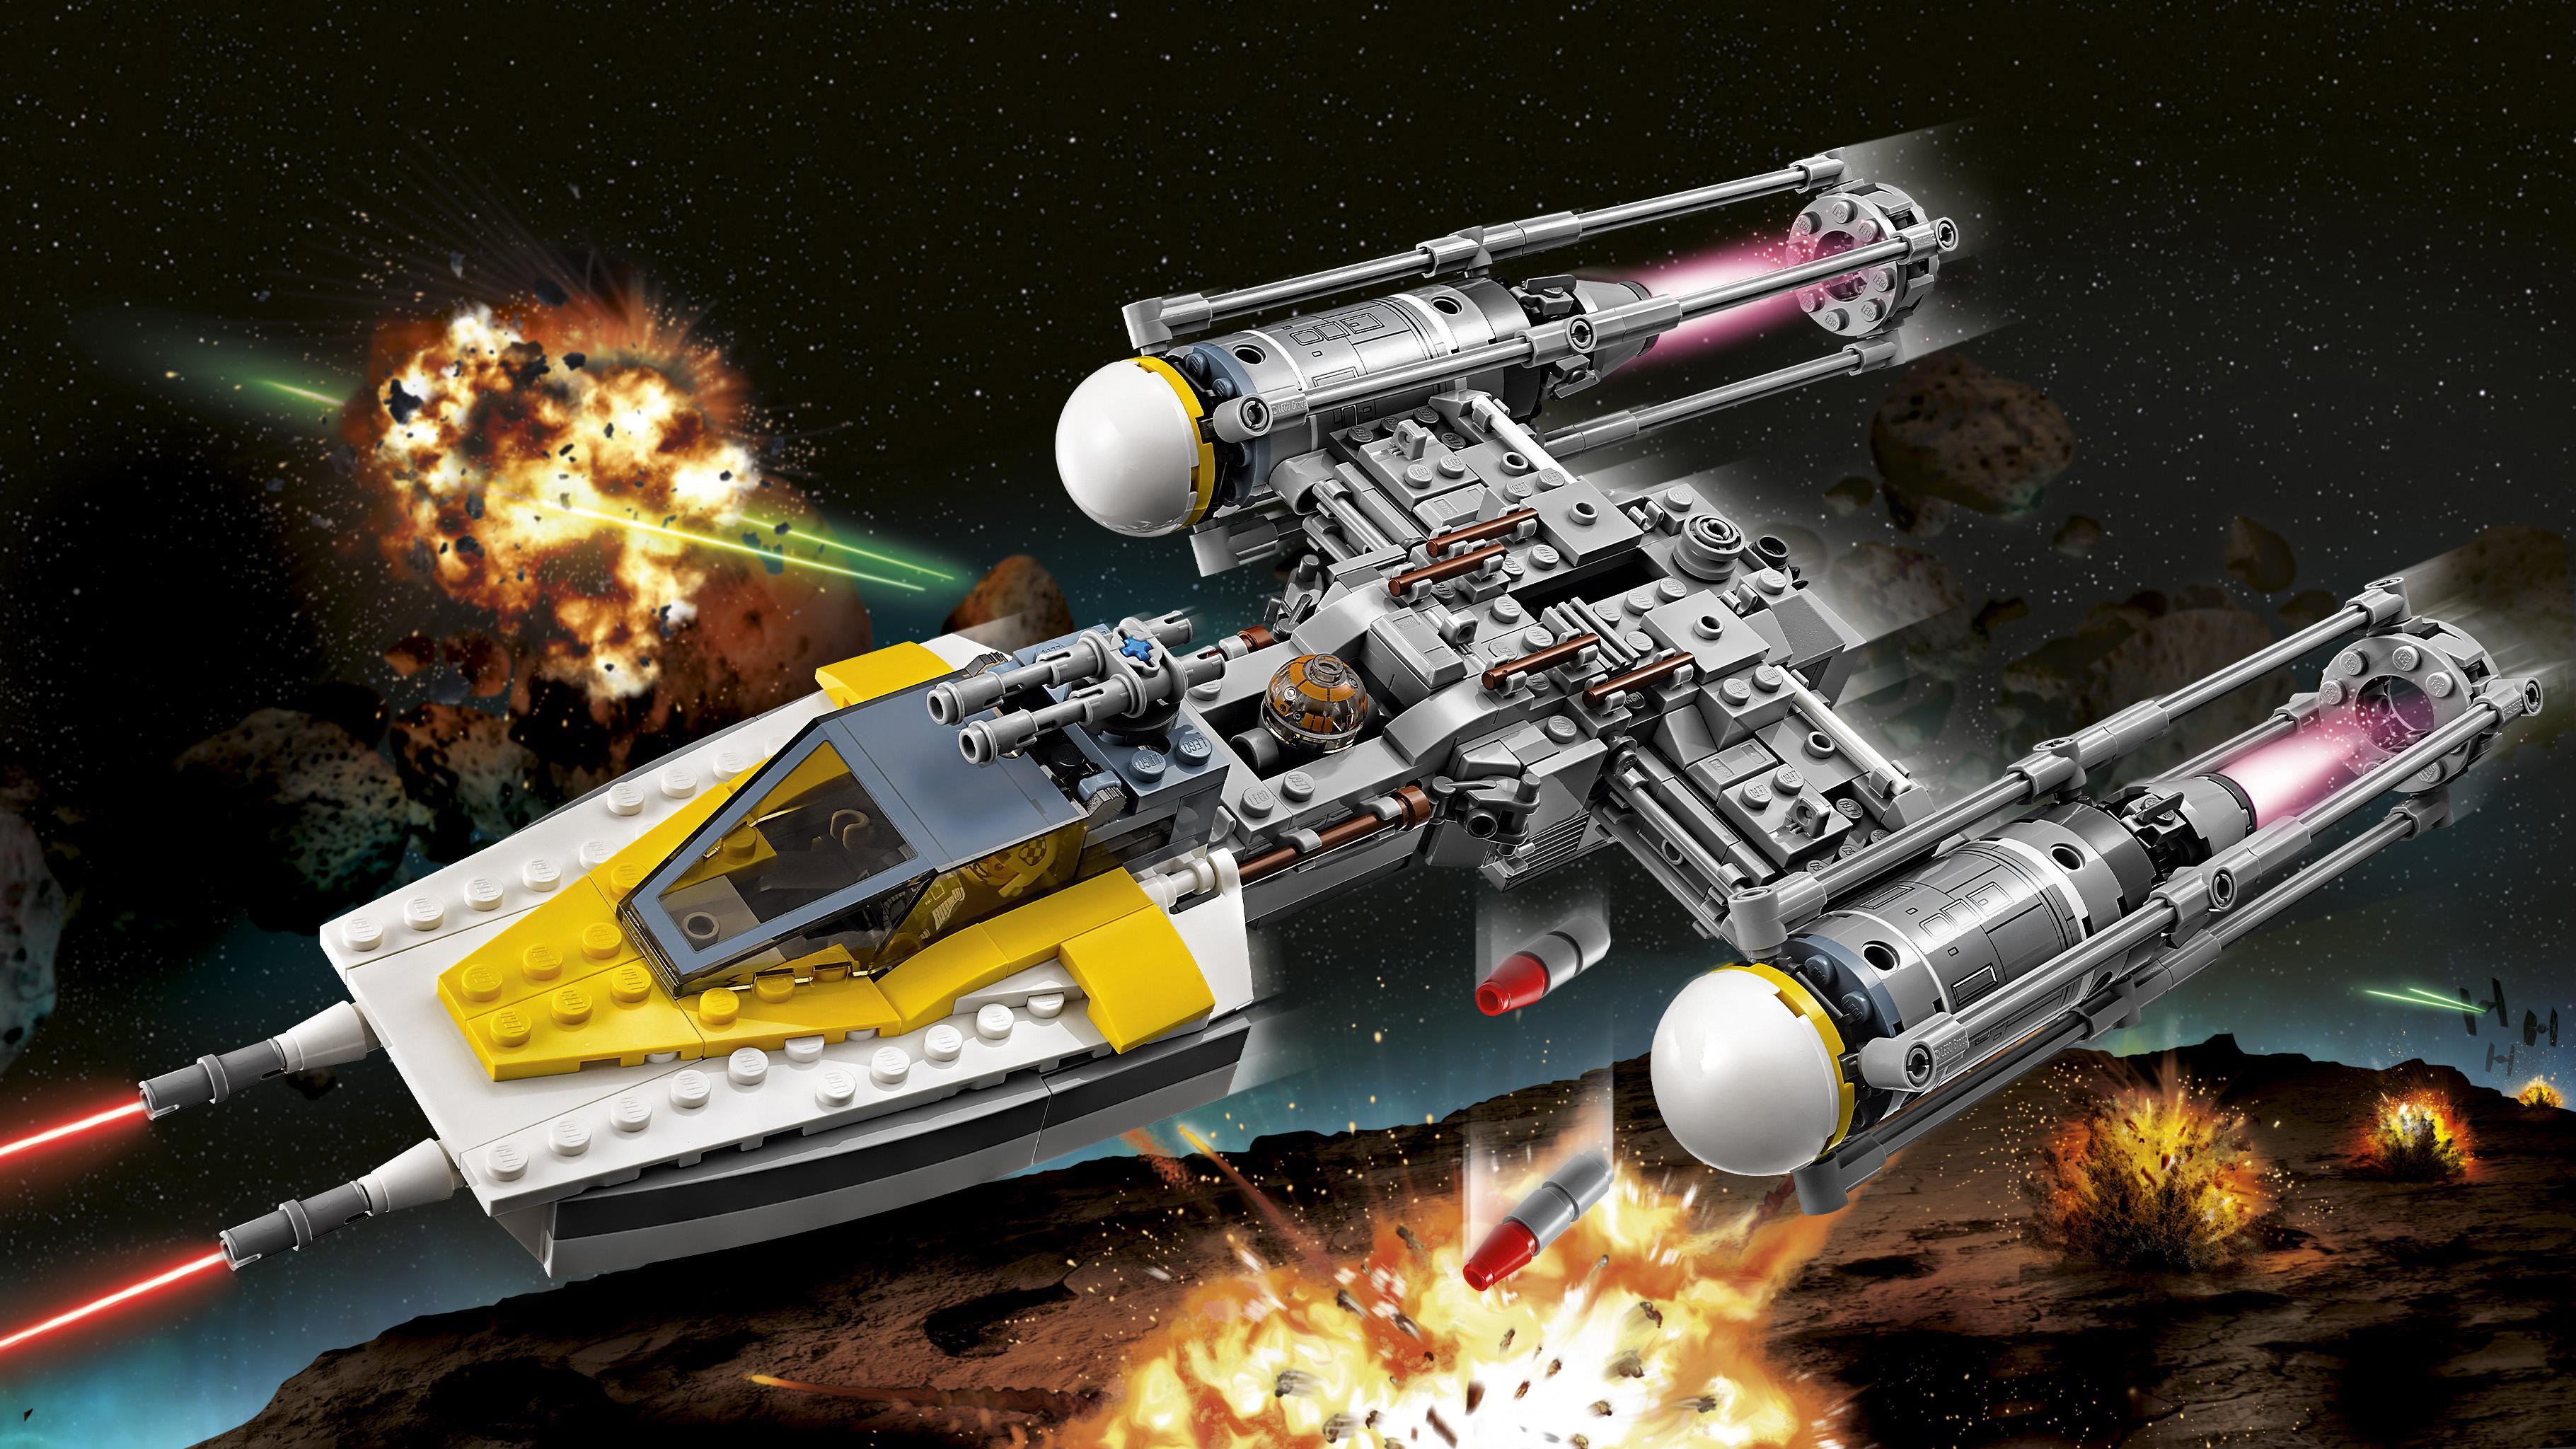 Lego star wars y wing starfighter 75172 - Lego star warse ...